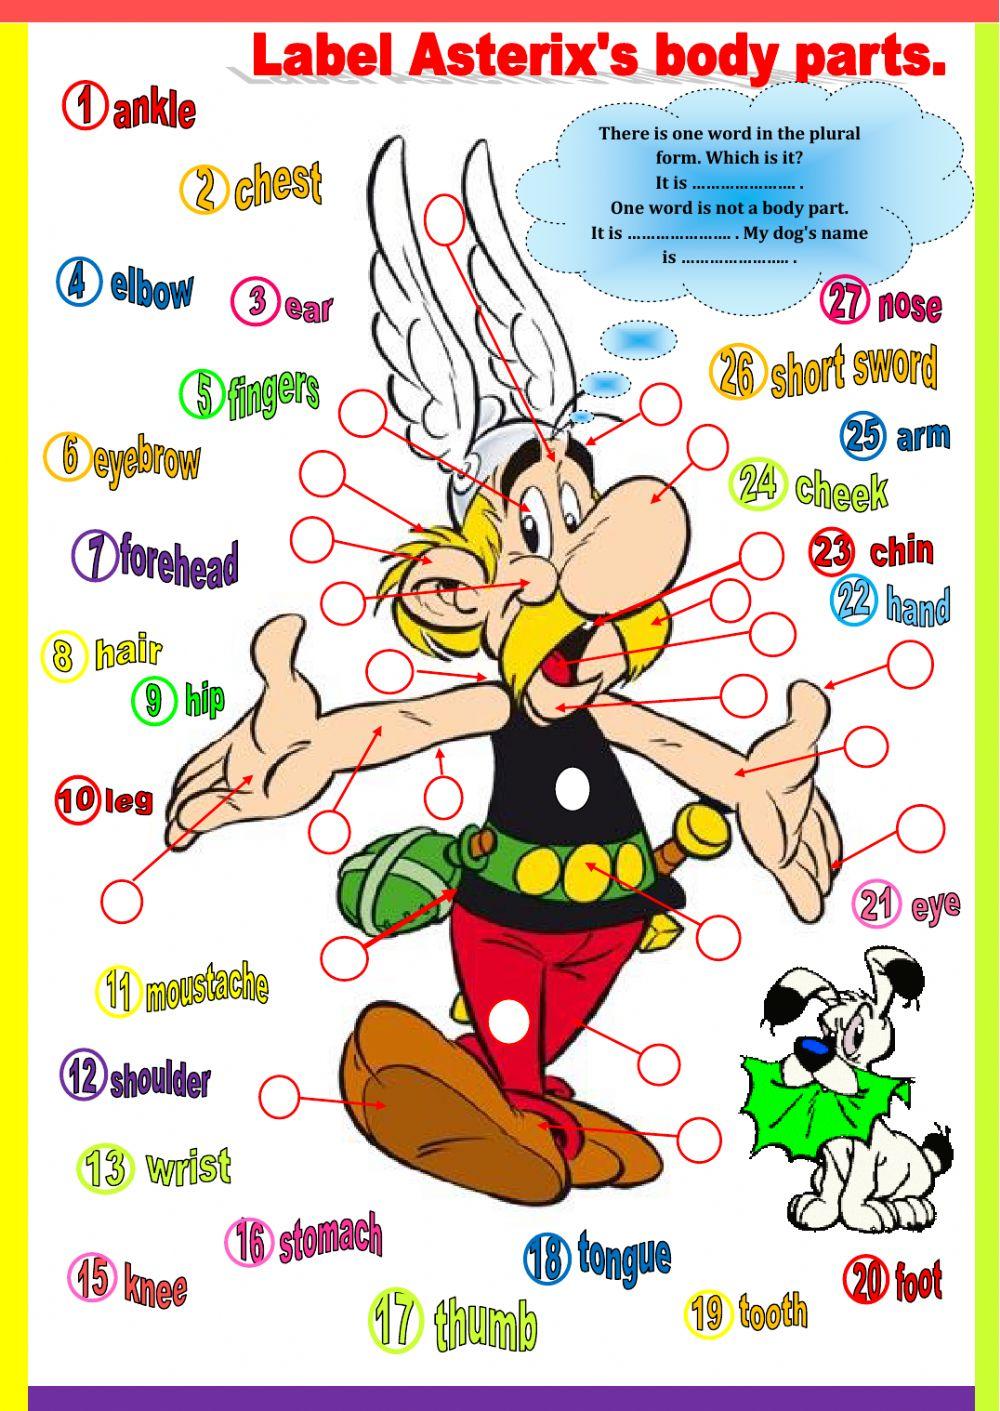 Asterix's Body Parts